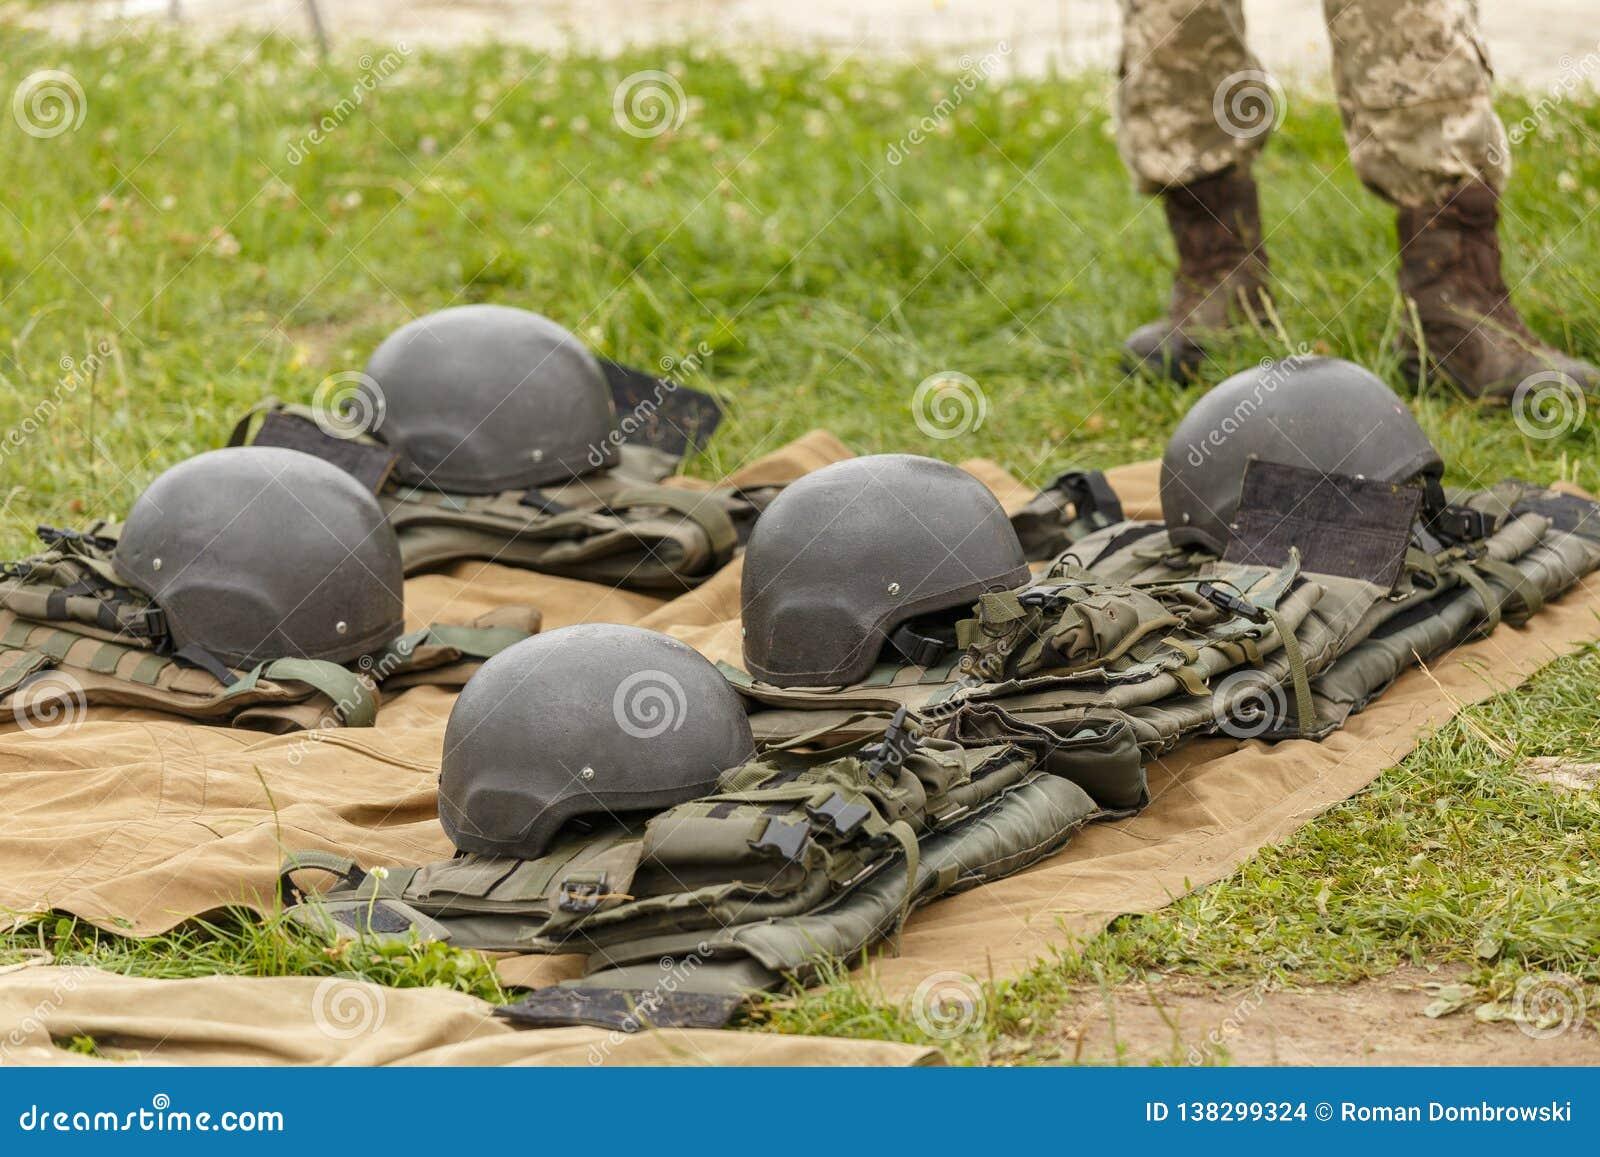 Cammuffi i rivestimenti ed i caschi di antiaerea di combattimento allineati sulla terra